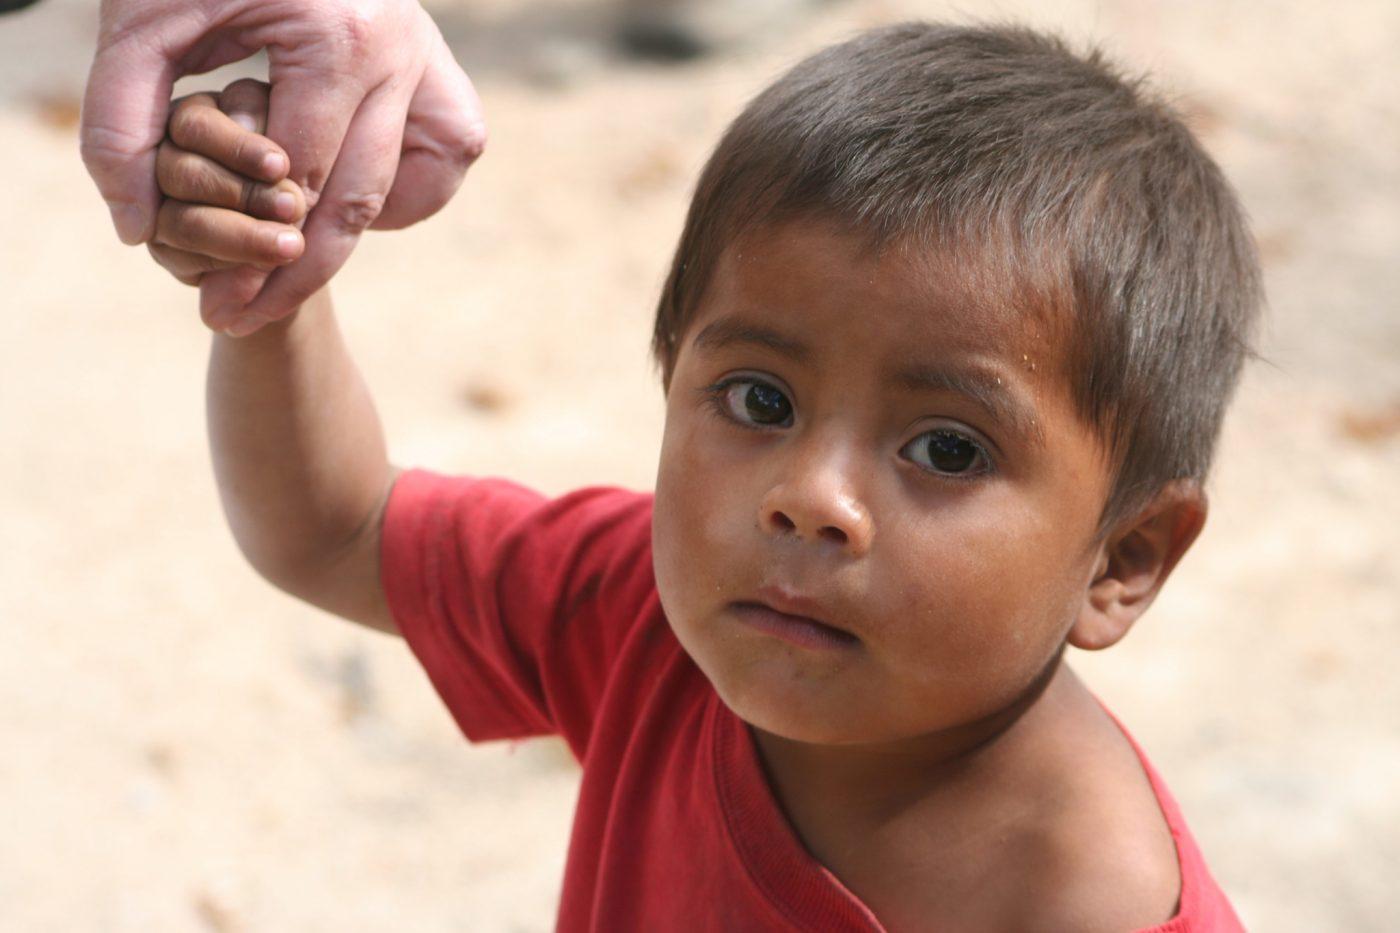 Lenca boy in Honduras. The Lenca are one of the indigenous peoples fighting against corporate land seizures in Honduras (Honduras2012 ChurchBuild/Flickr)